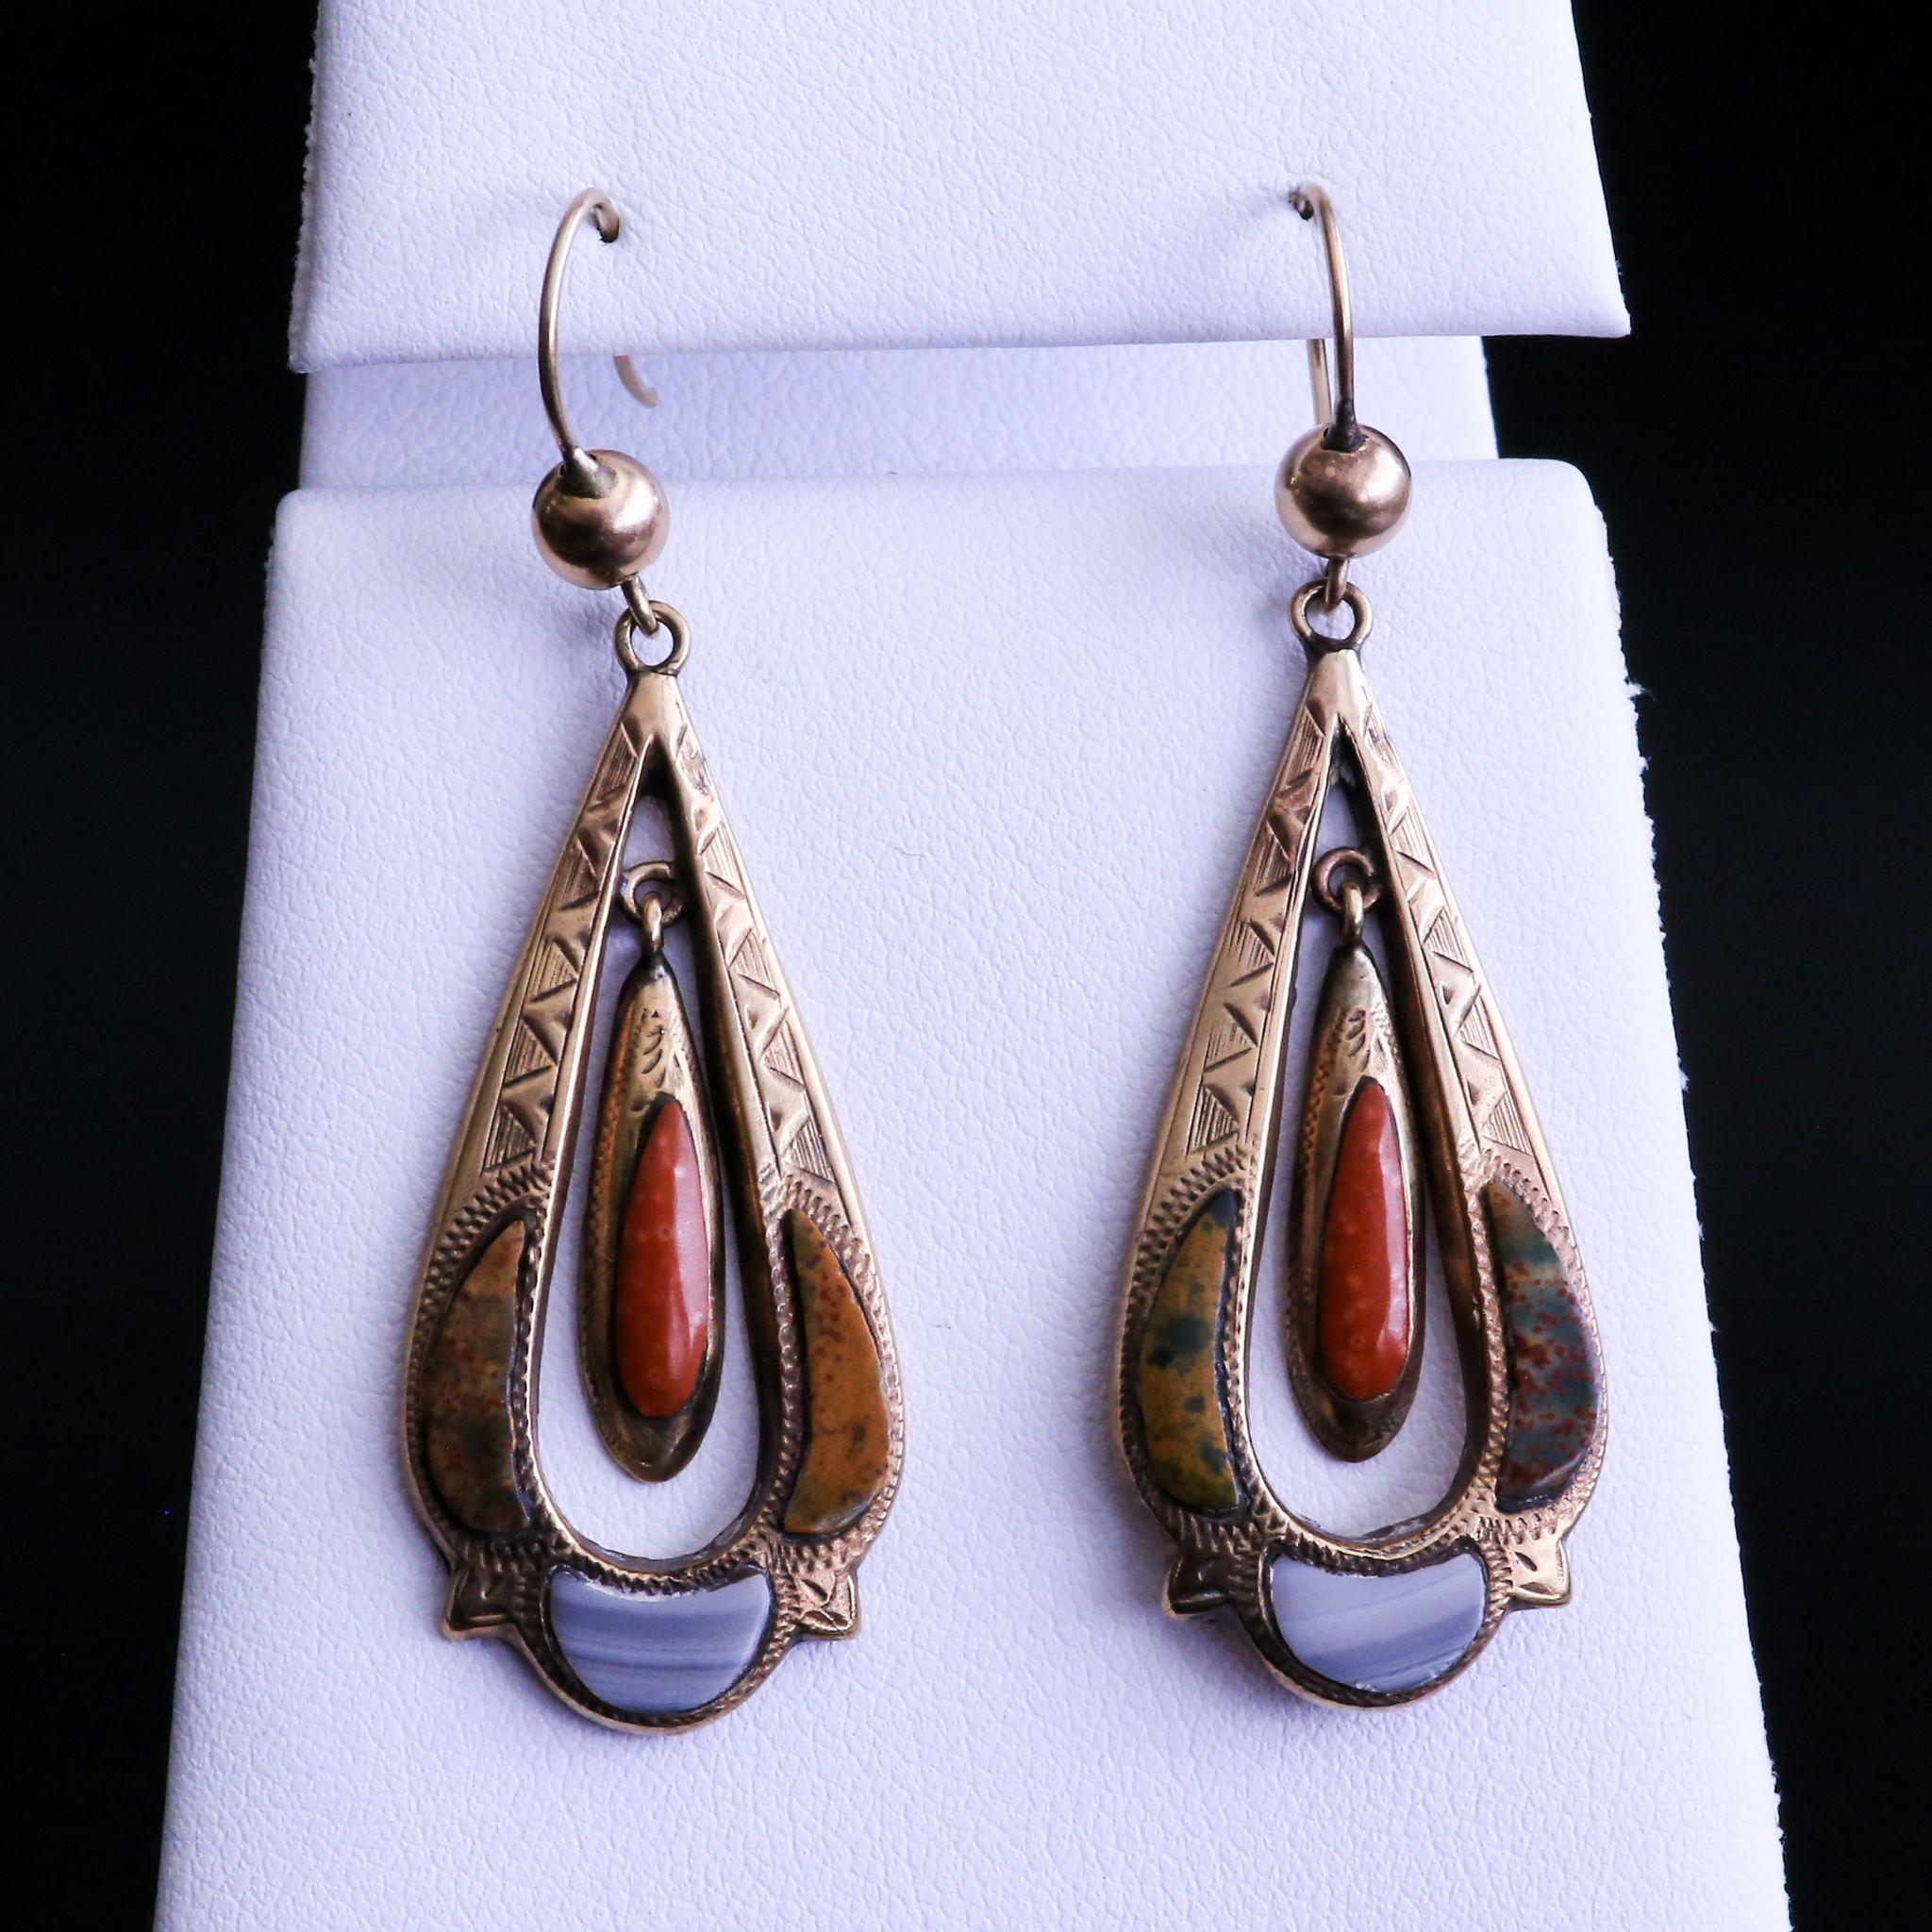 Very Rare Lady's Enameled Agate 9K Art Nouveau Earrings